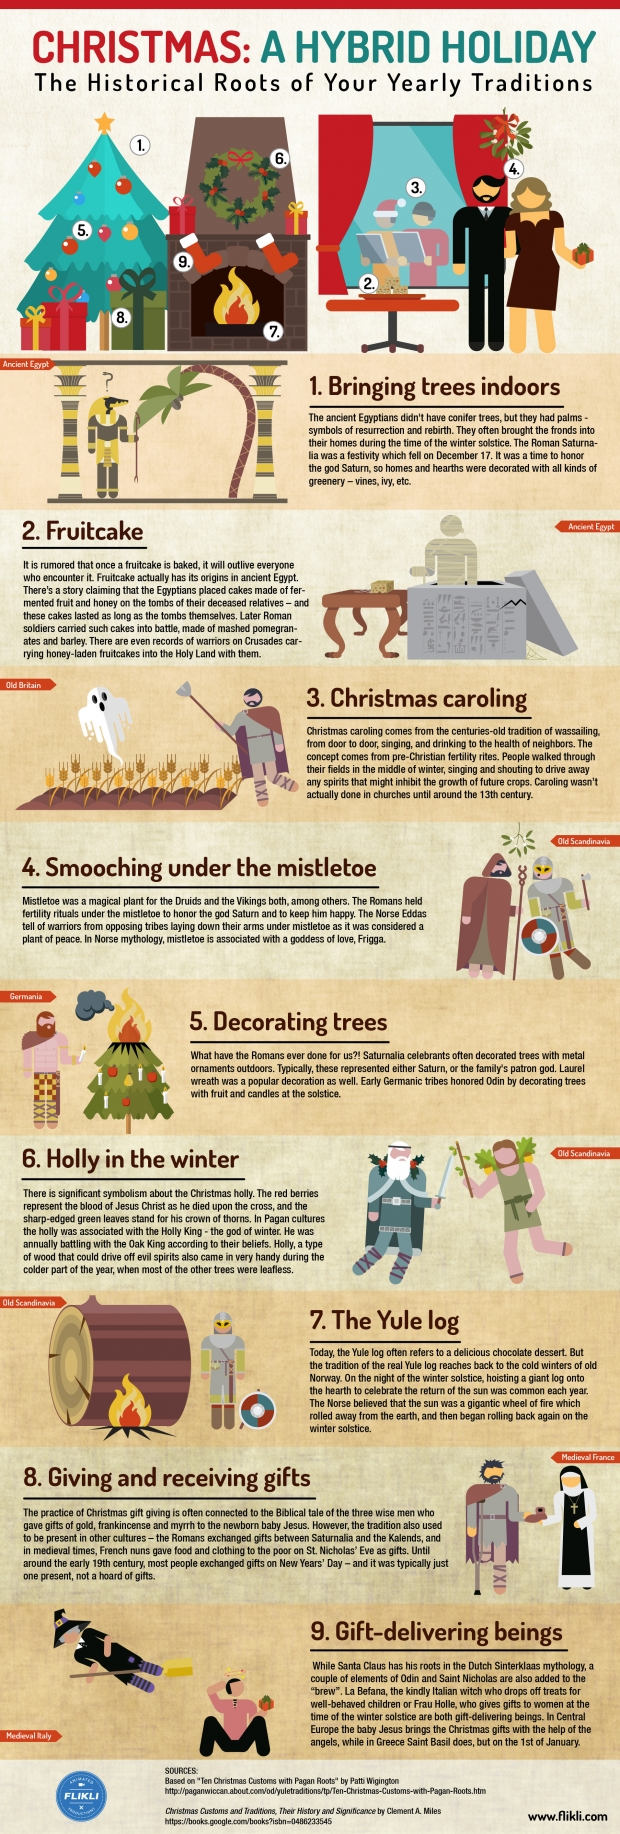 Christmas: A Hybrid Holiday